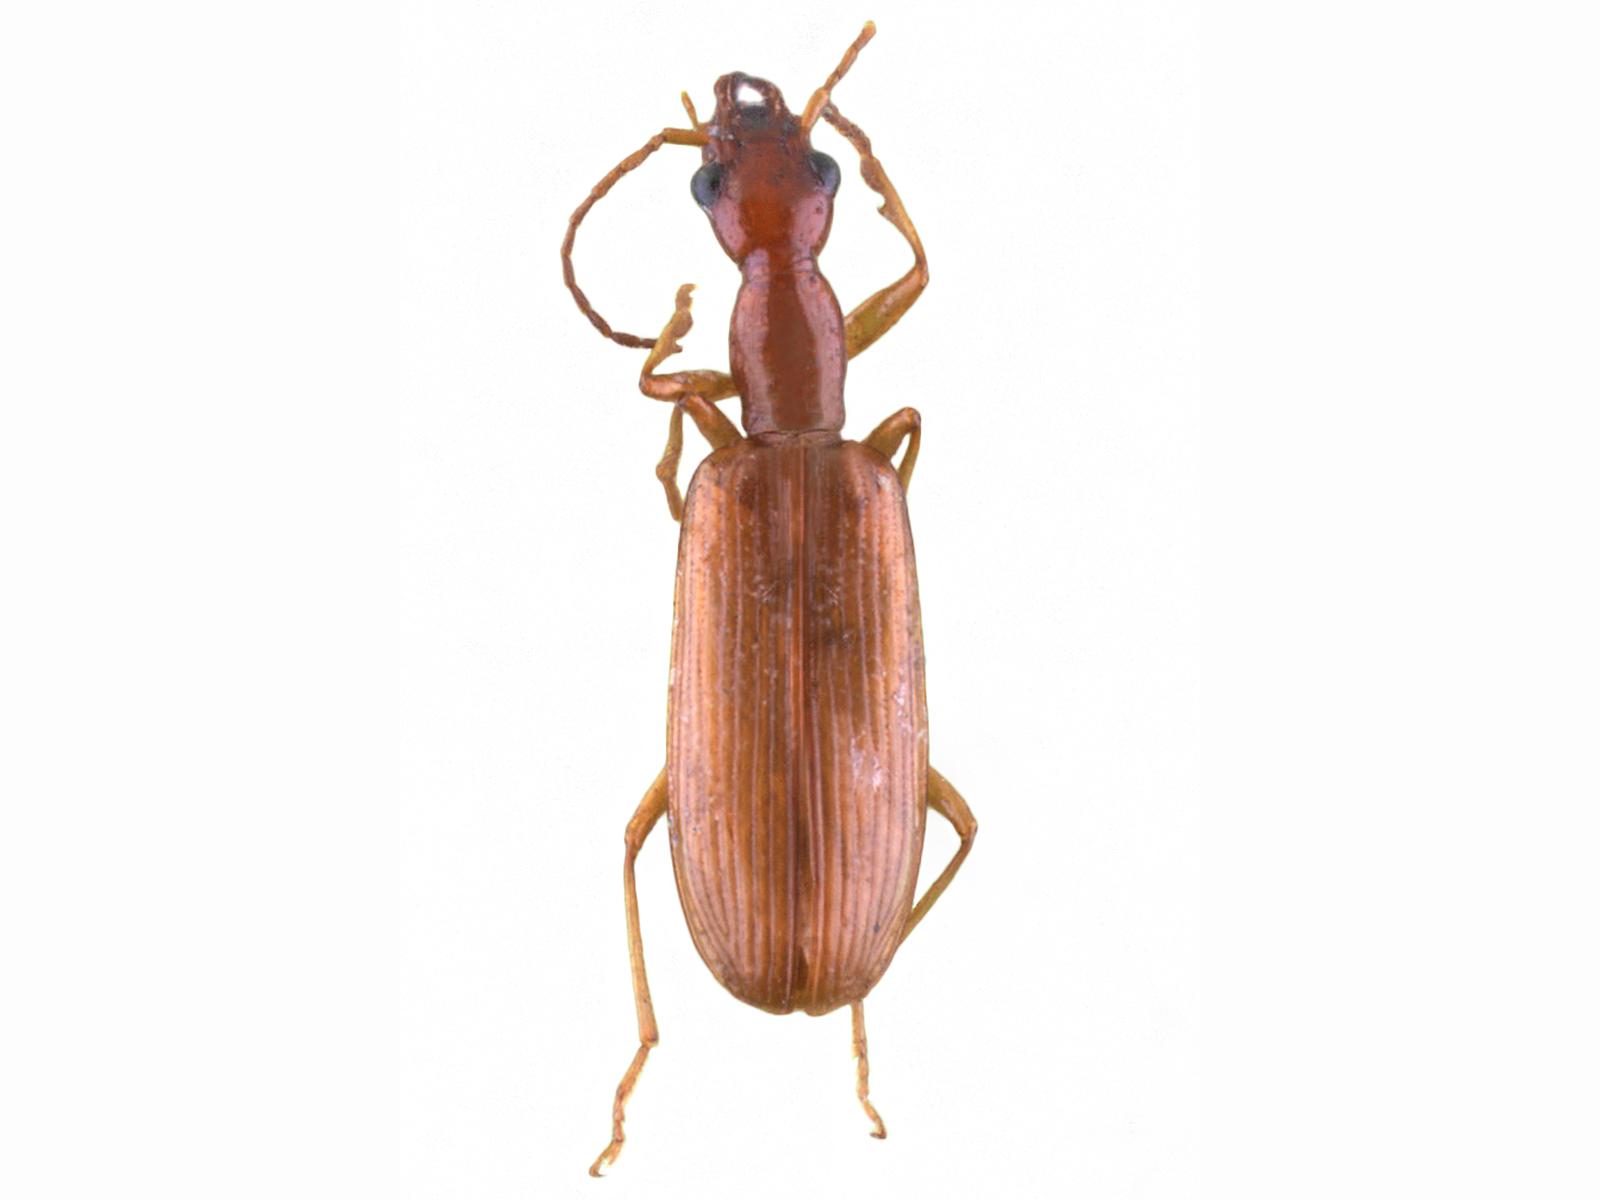 Leptotrachelus spp.